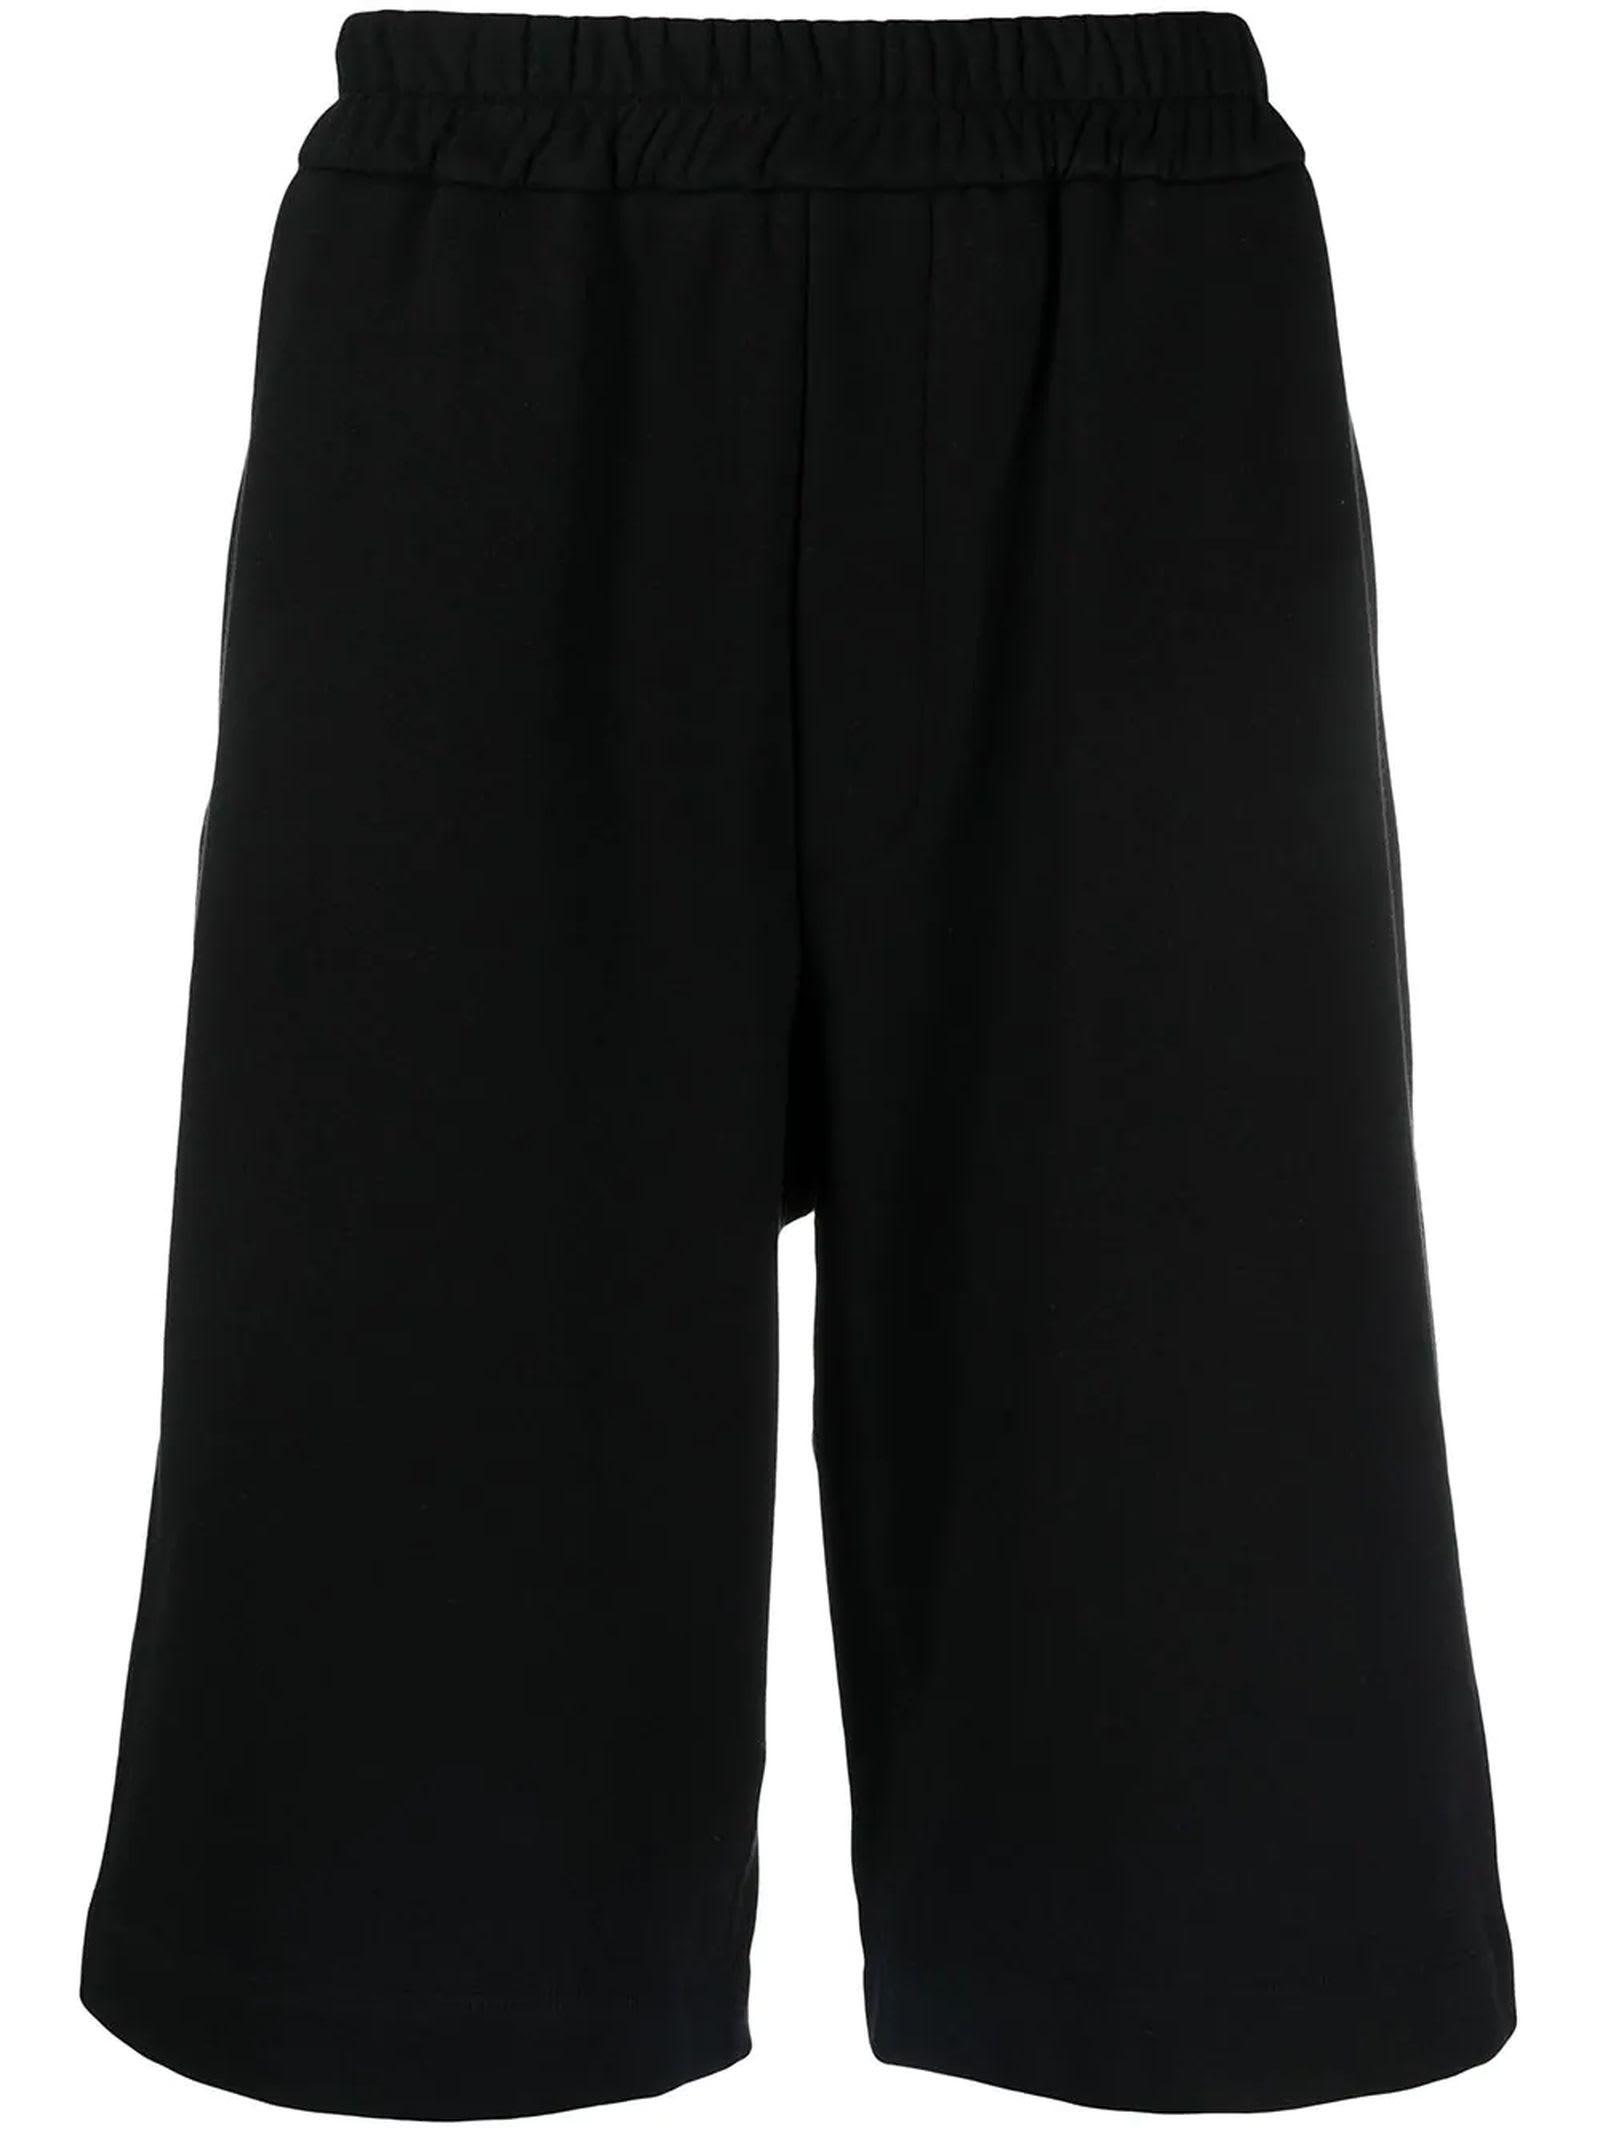 Jil Sander Black Cotton Shorts